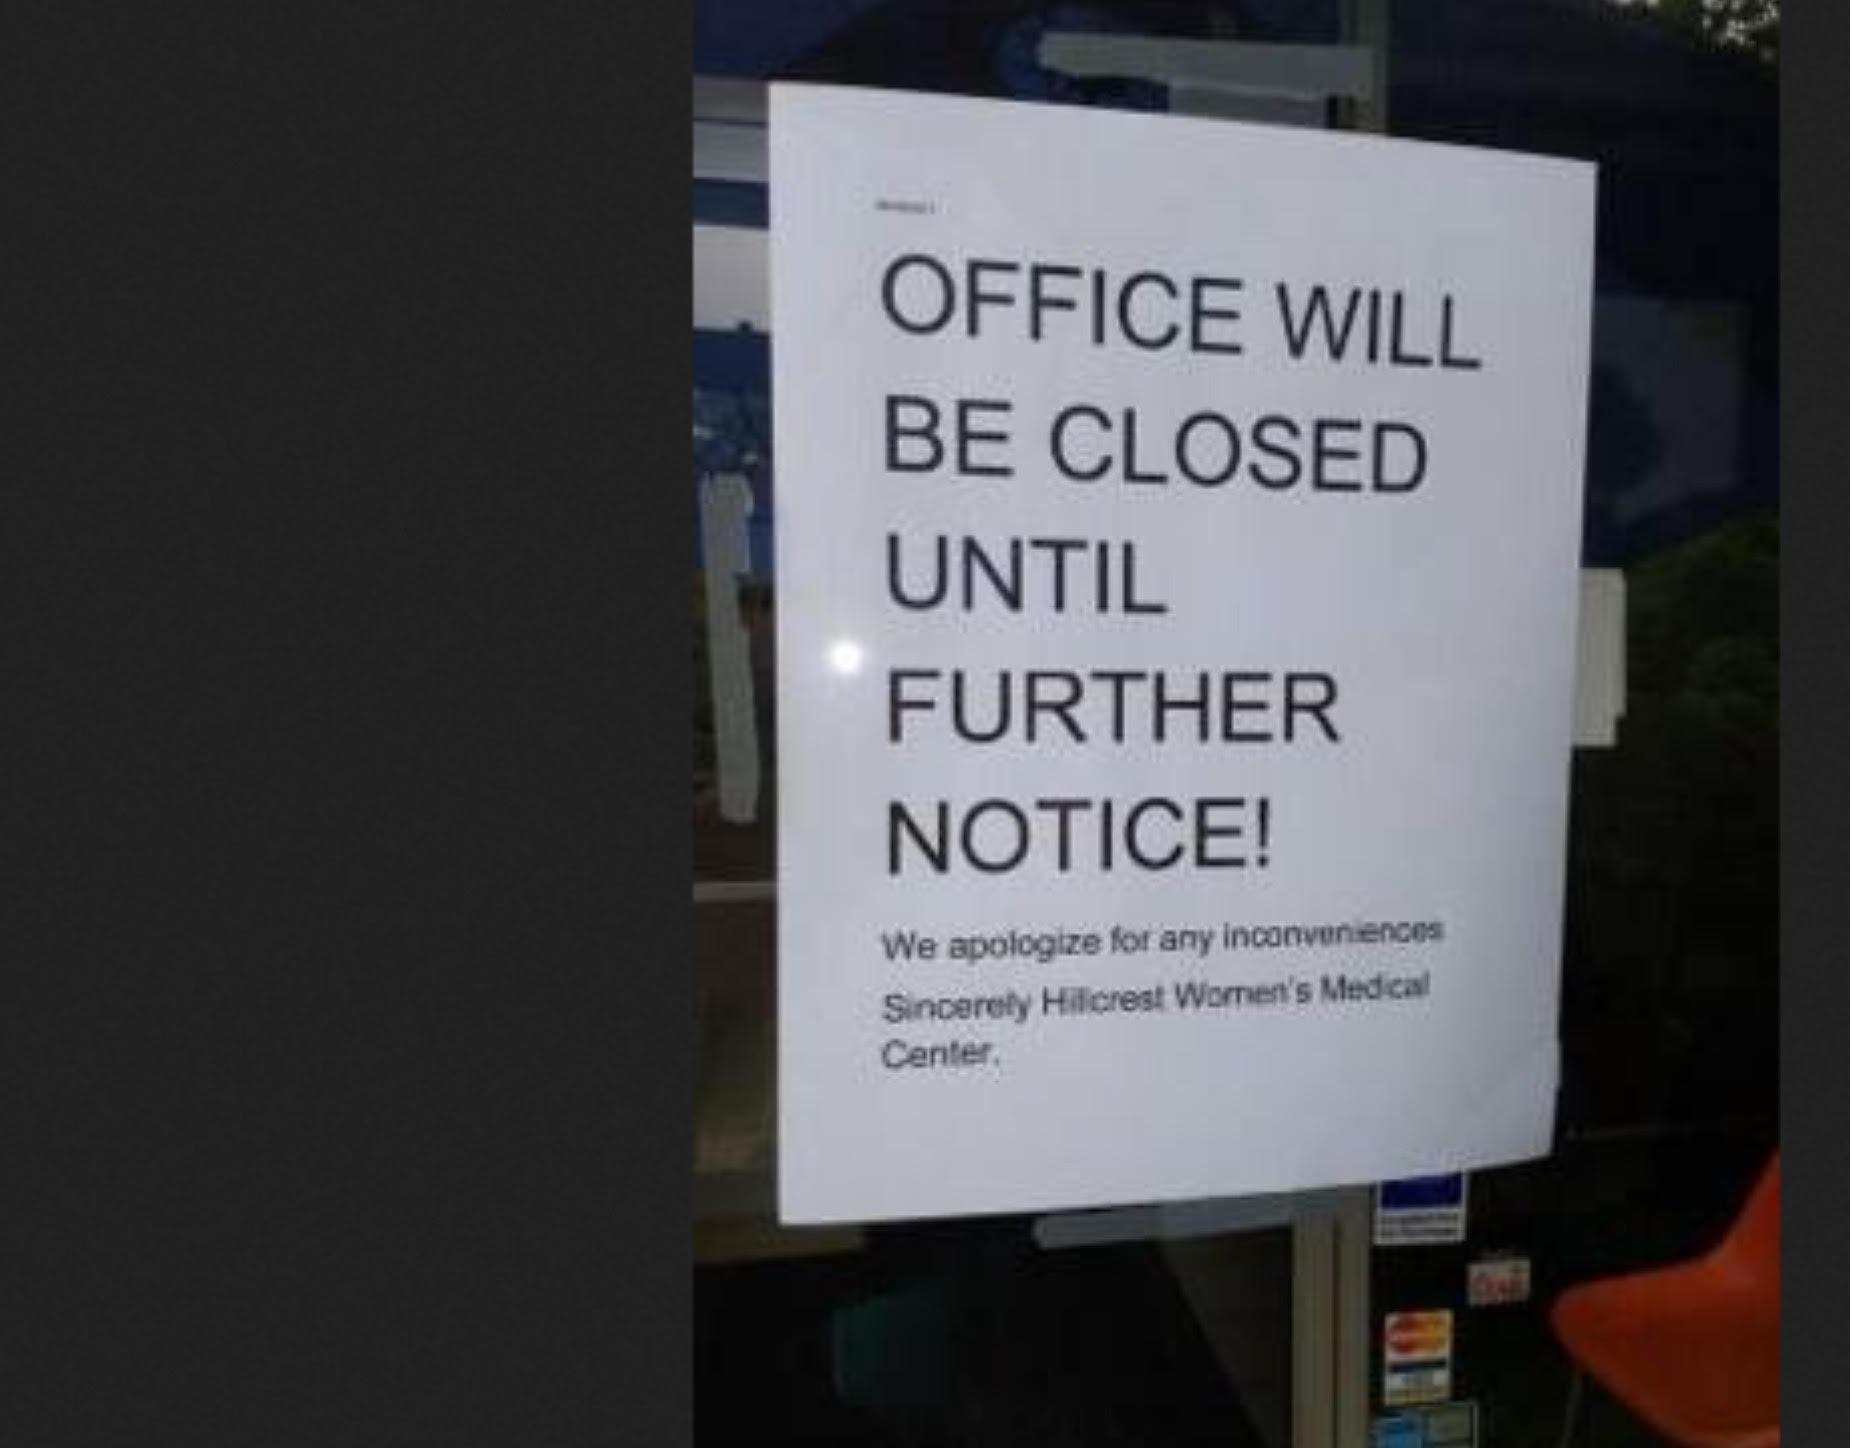 Harrisburg, PA - Hillcrest Women's Medical Center closure